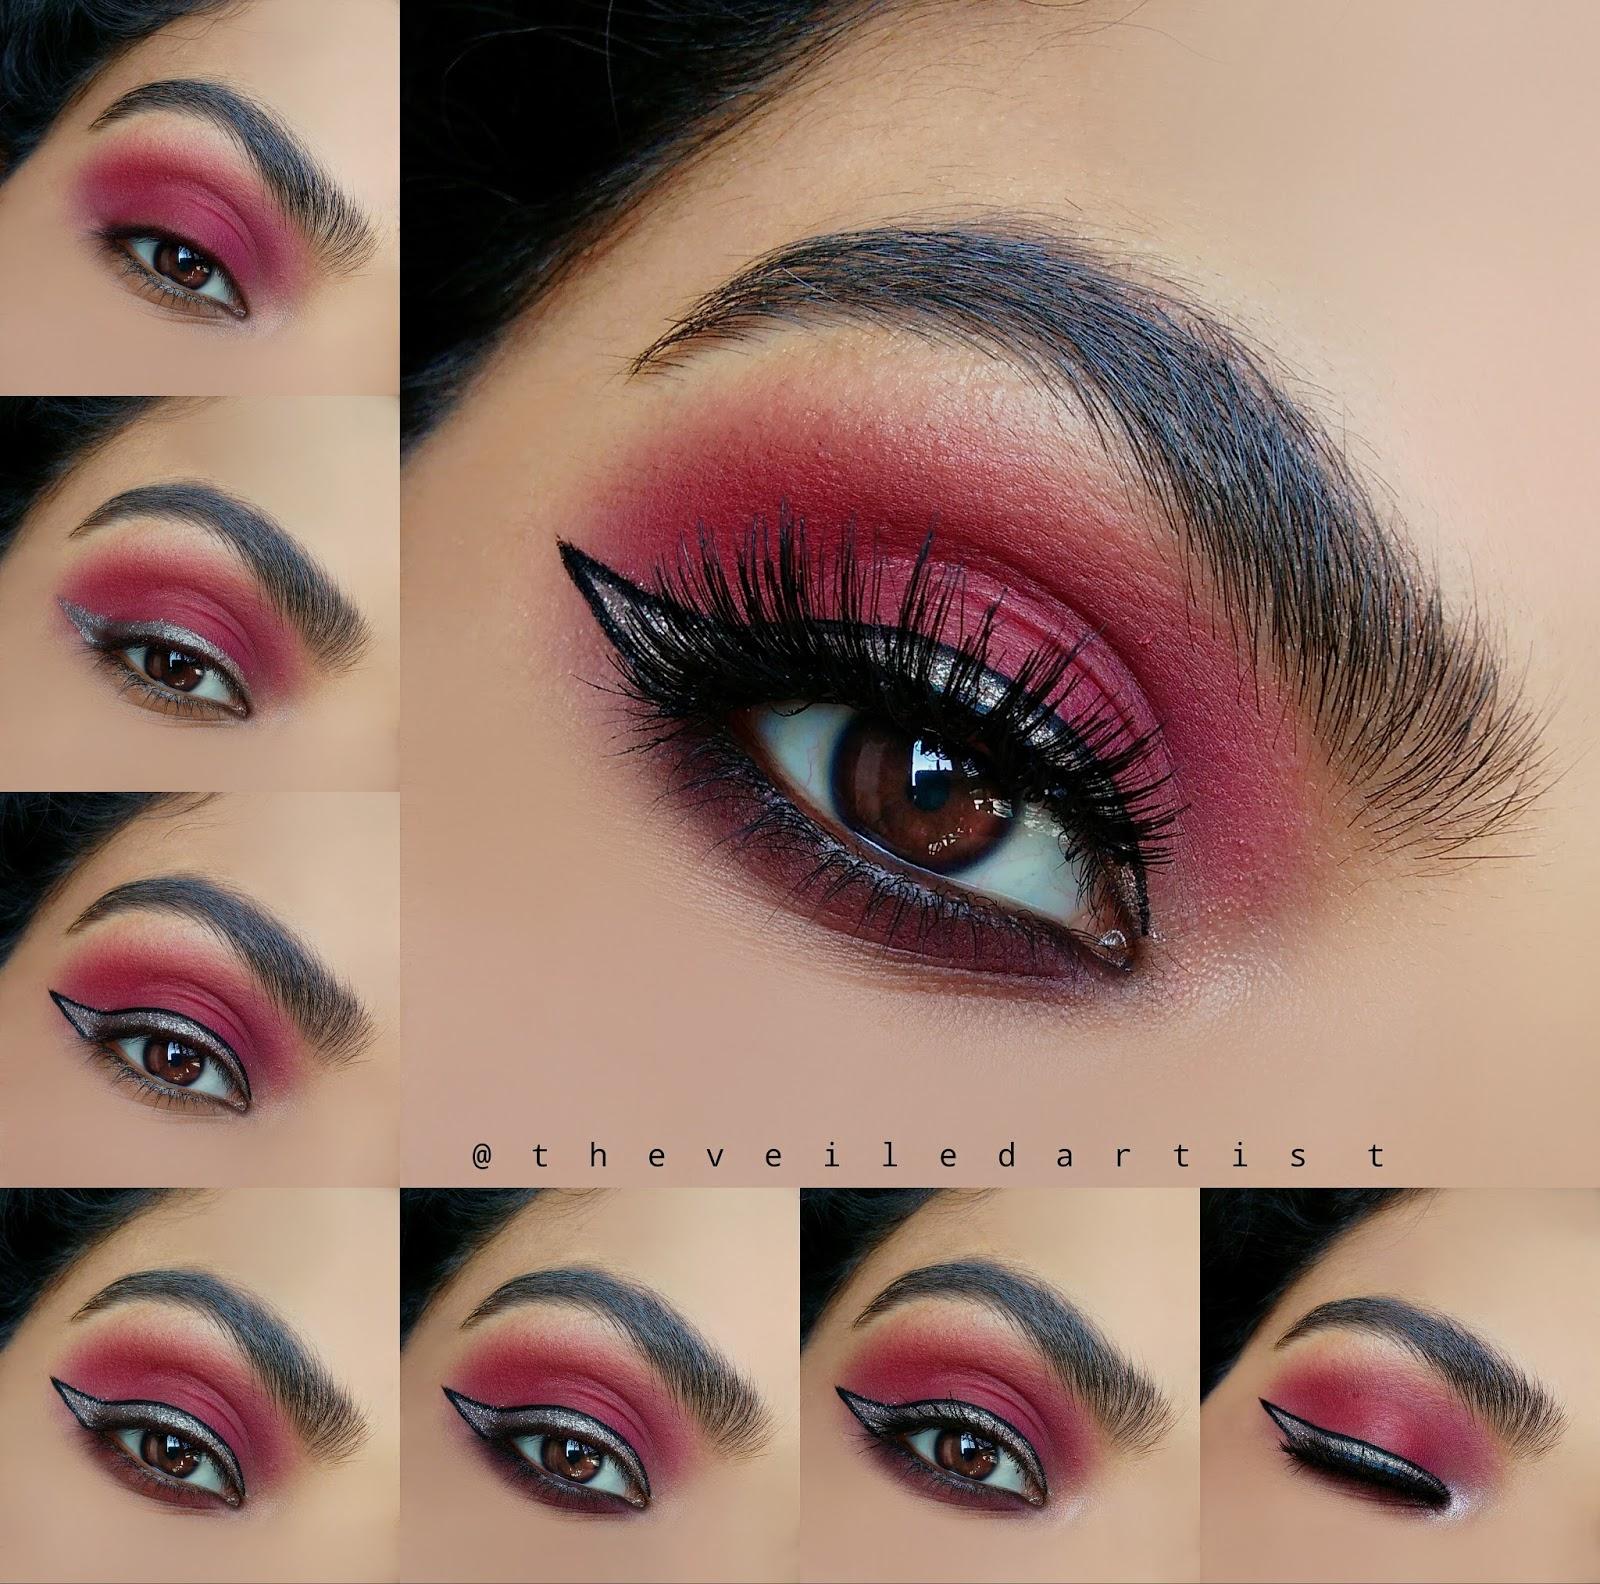 Simple 7 Step Statement Eyeshadow Look With Sparkly Liner Tutorial